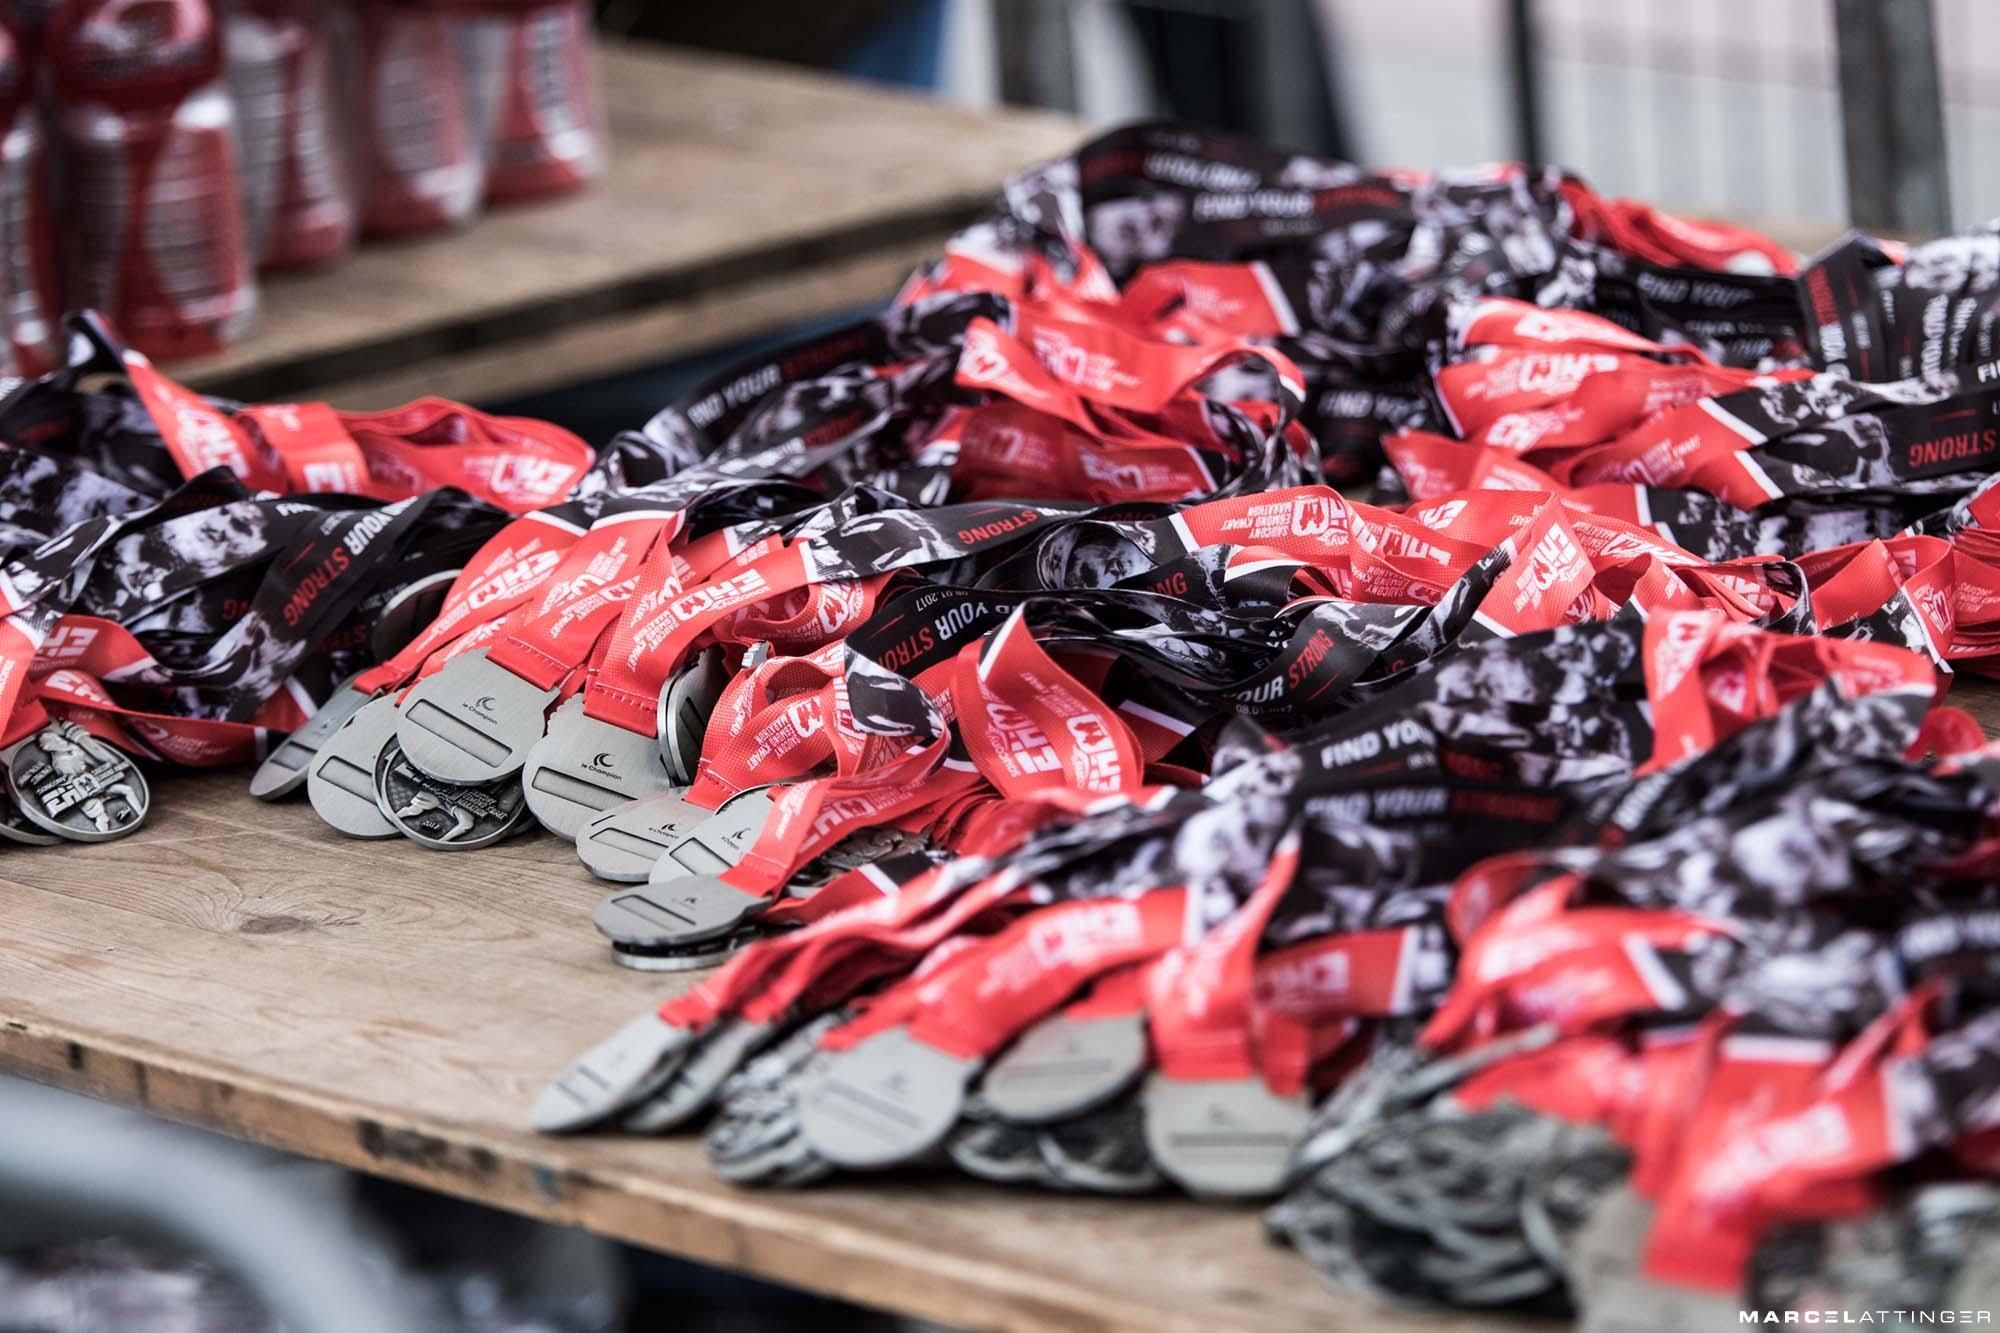 Medailles van de Egmond Halve Marathon